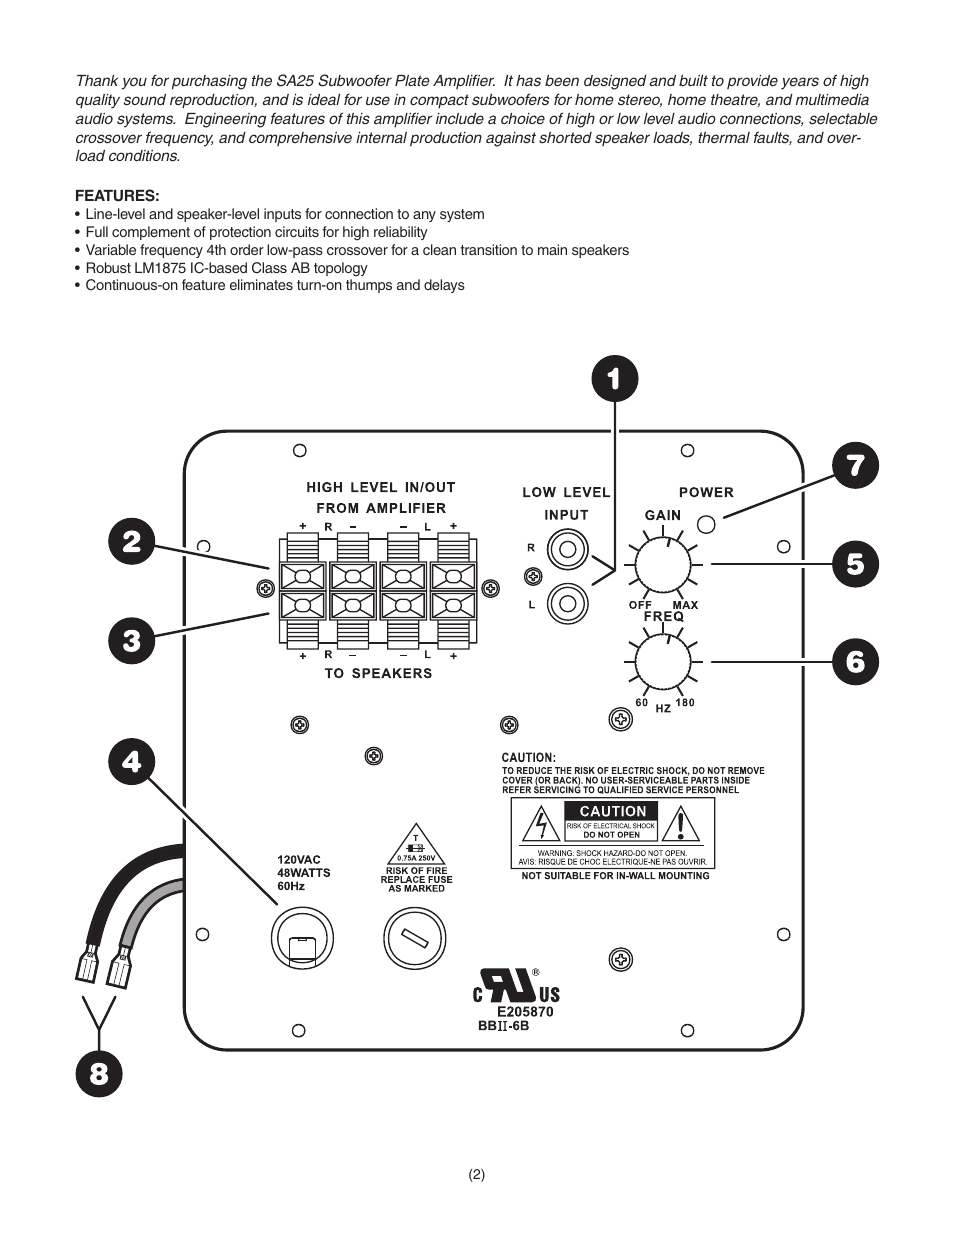 Dayton Audio SA25 25W Subwoofer Plate Amplifier User Manual